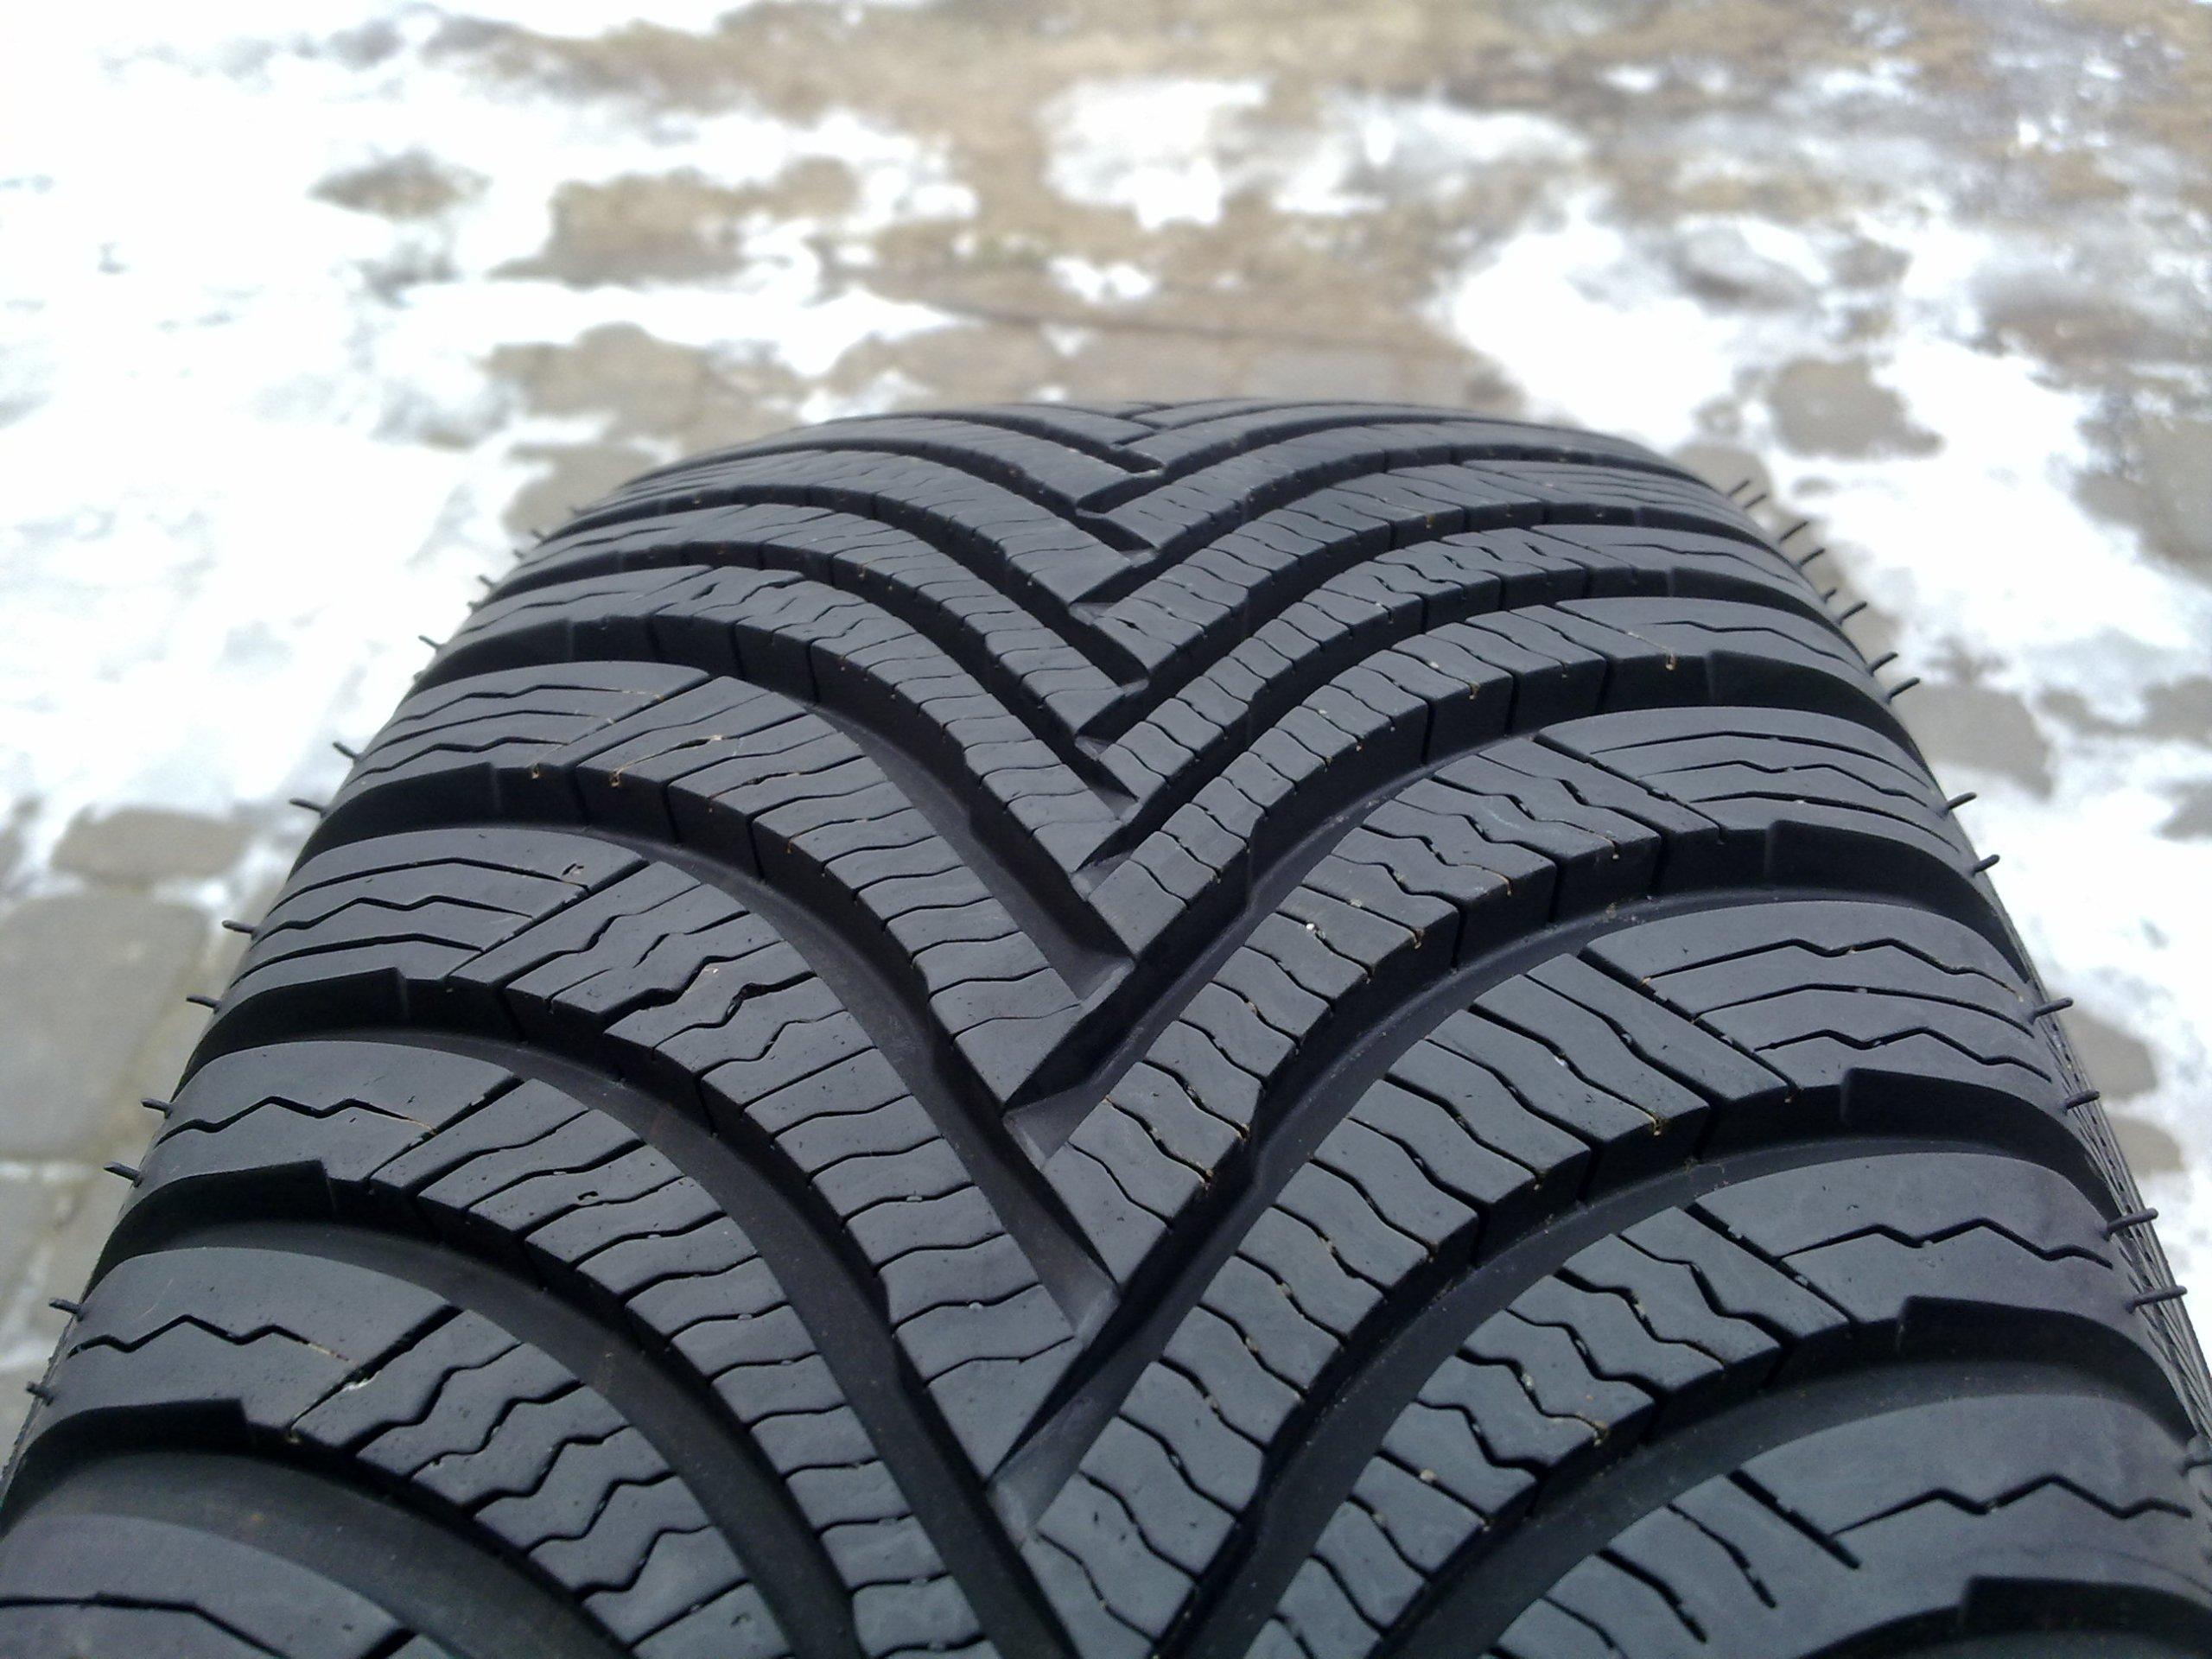 Opony Zimowe Michelin Alpin 5 195 65 R15 91t 4szt 7132031799